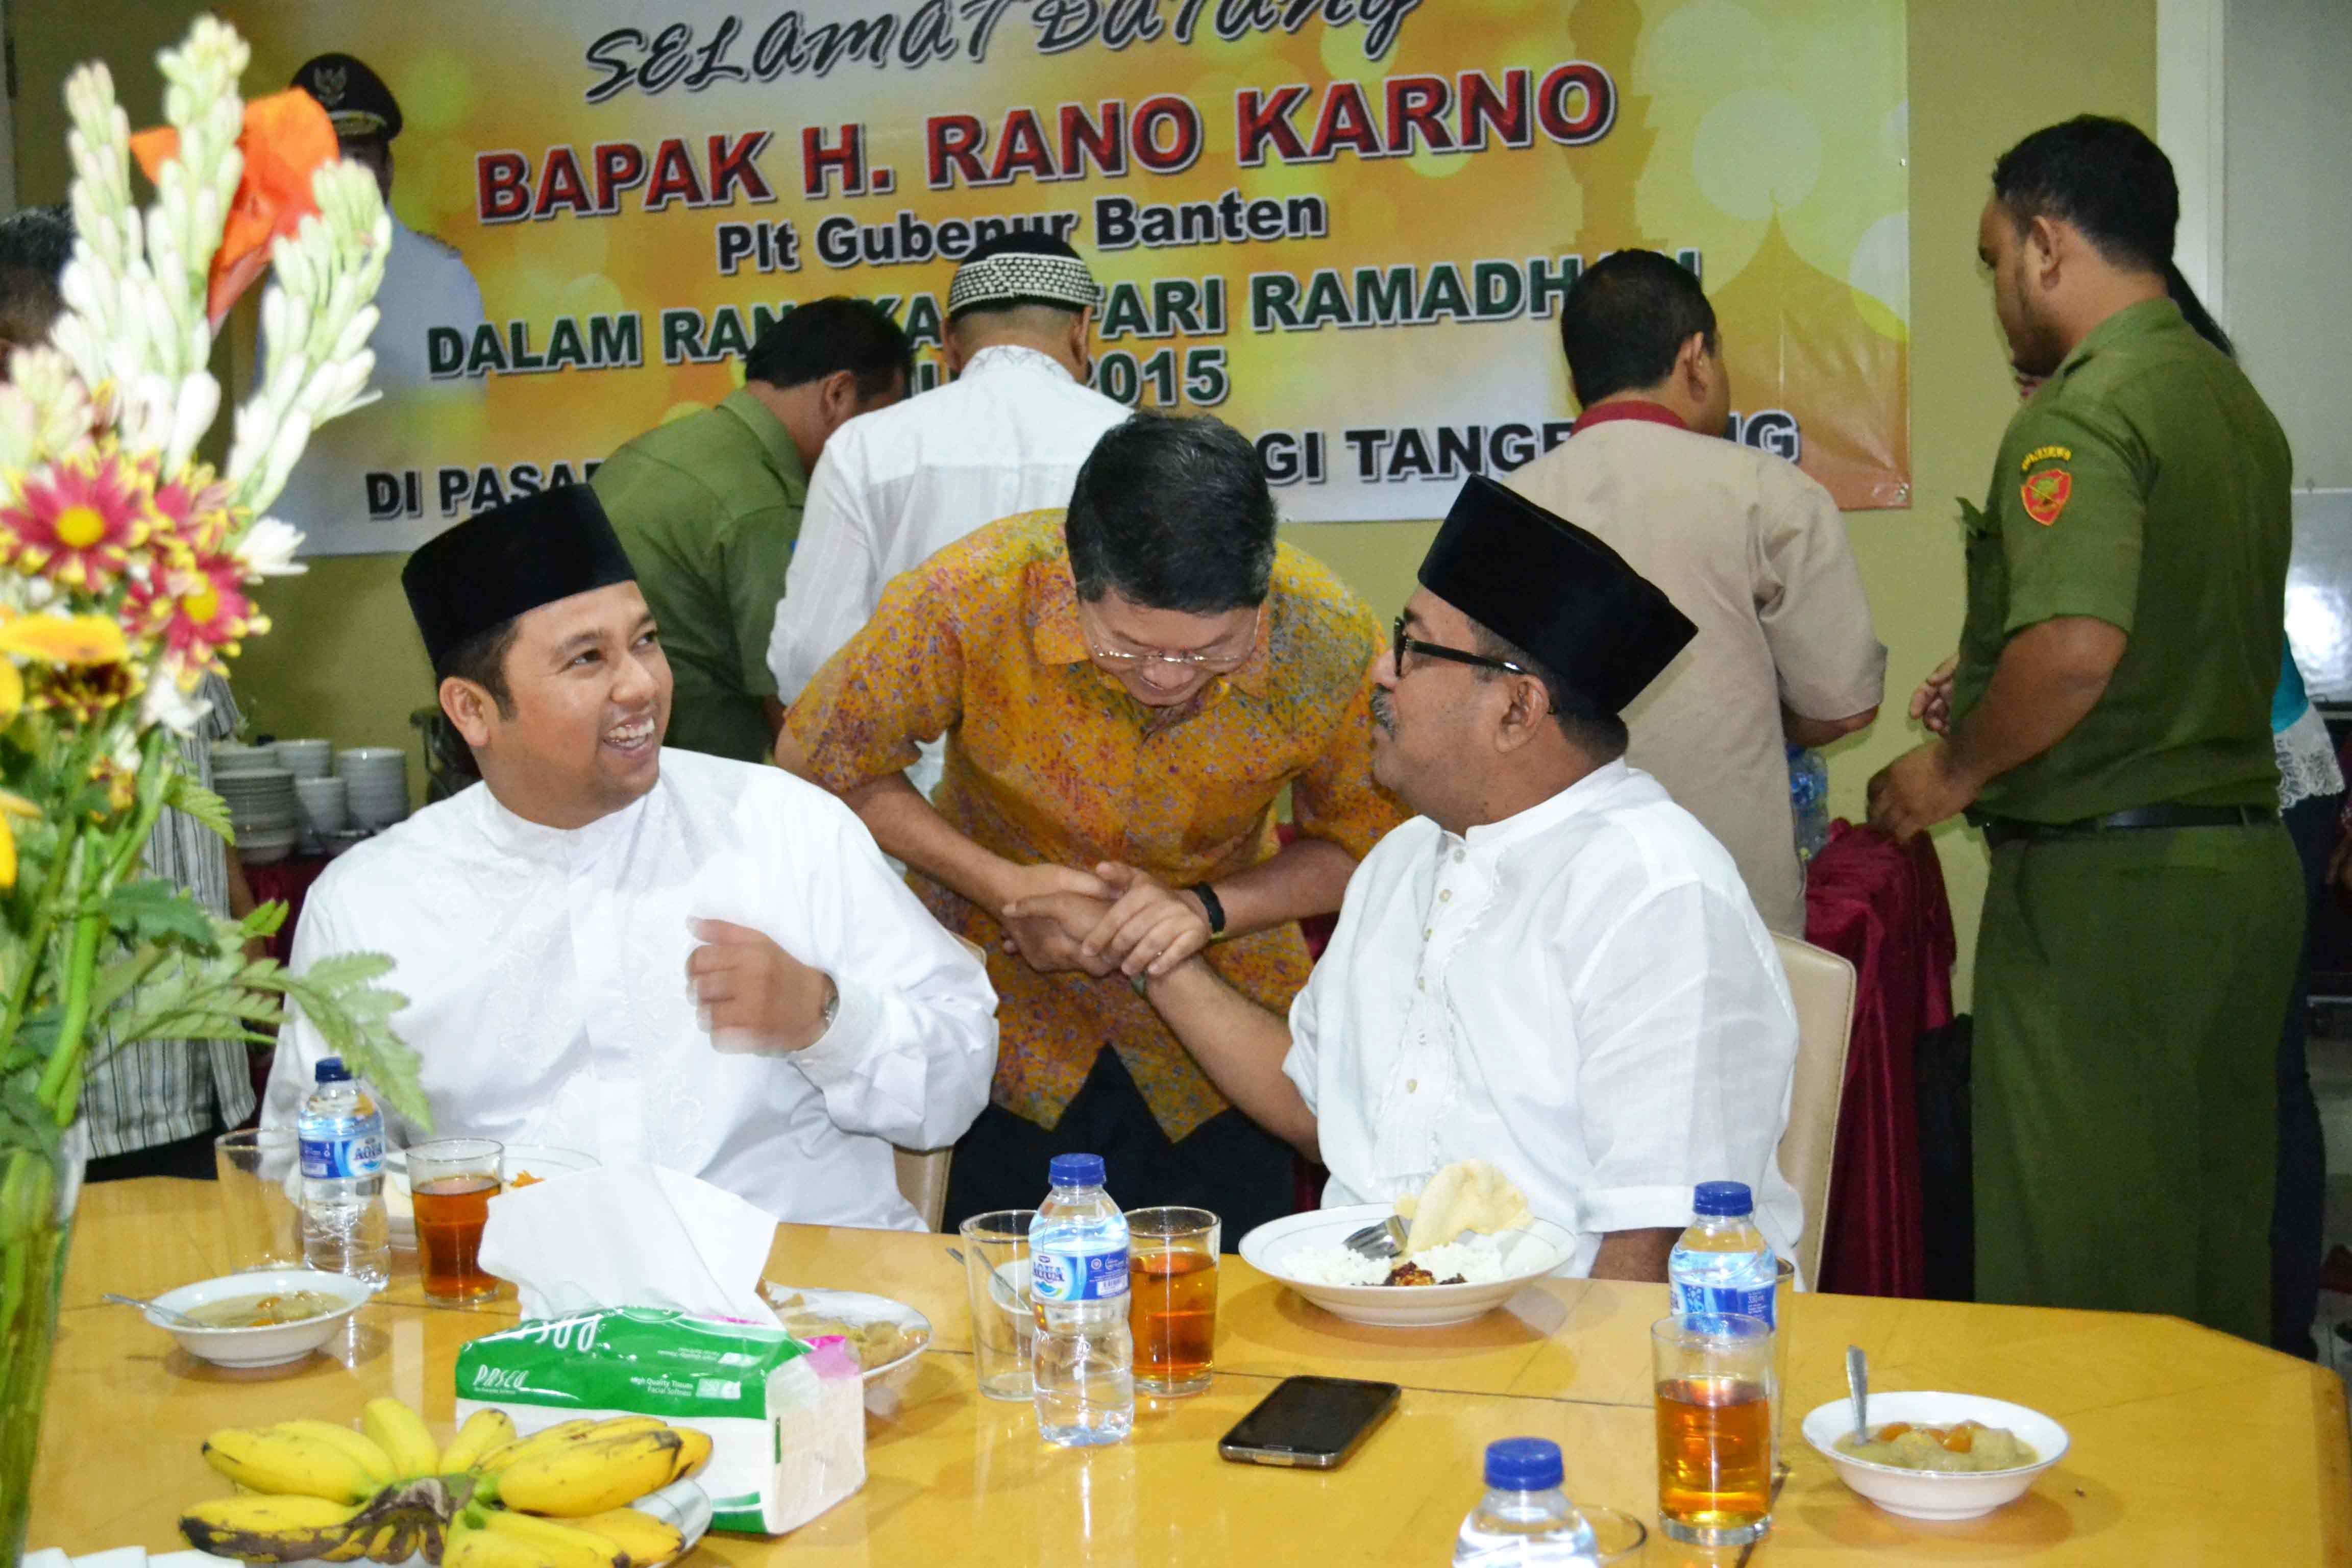 Kunjungan Pejabat Negara,Rano karno ( Wakil Gubernur Tangerang ), dan Arief Rachadiono Wismansyah ( Wakil Wali kota Tangerang ), Pasar Induk Tanah Tinggi